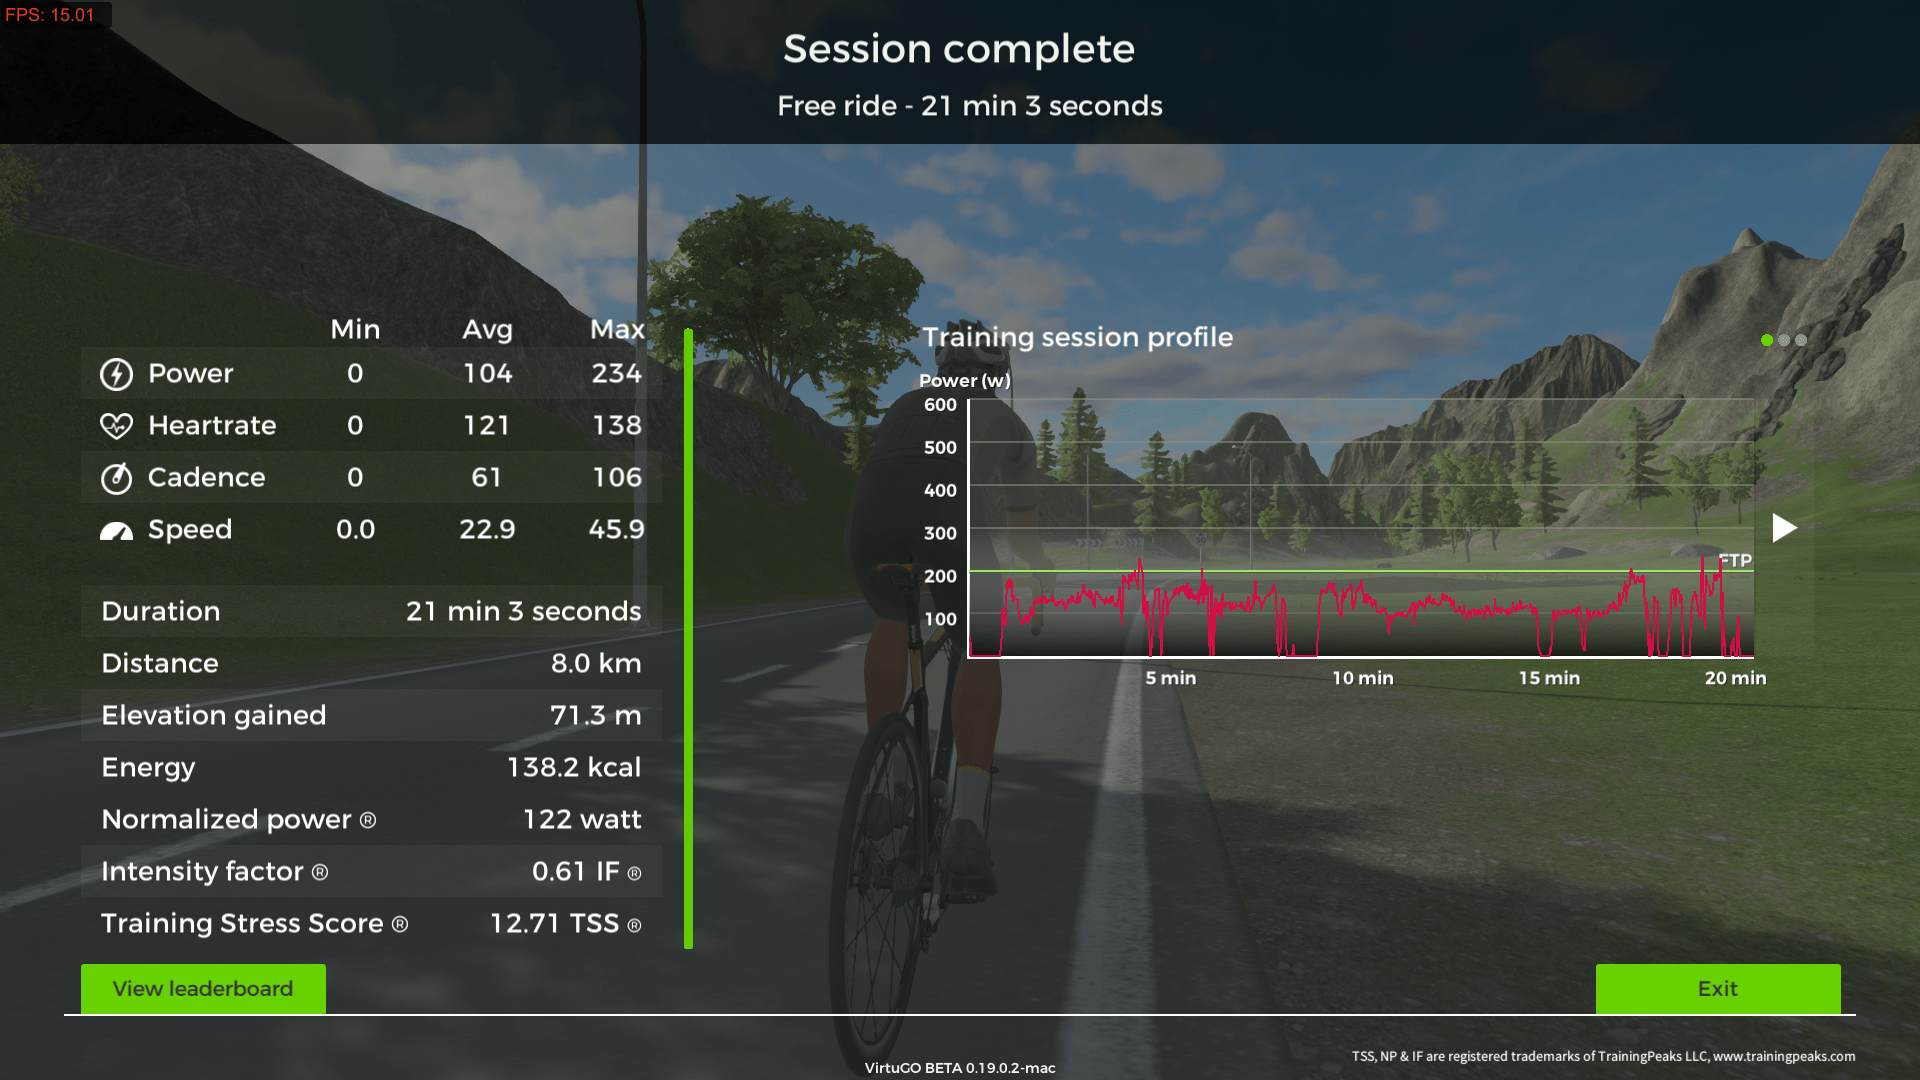 VirtuGO Beta - Free ride session completion statistics (Training Profile)